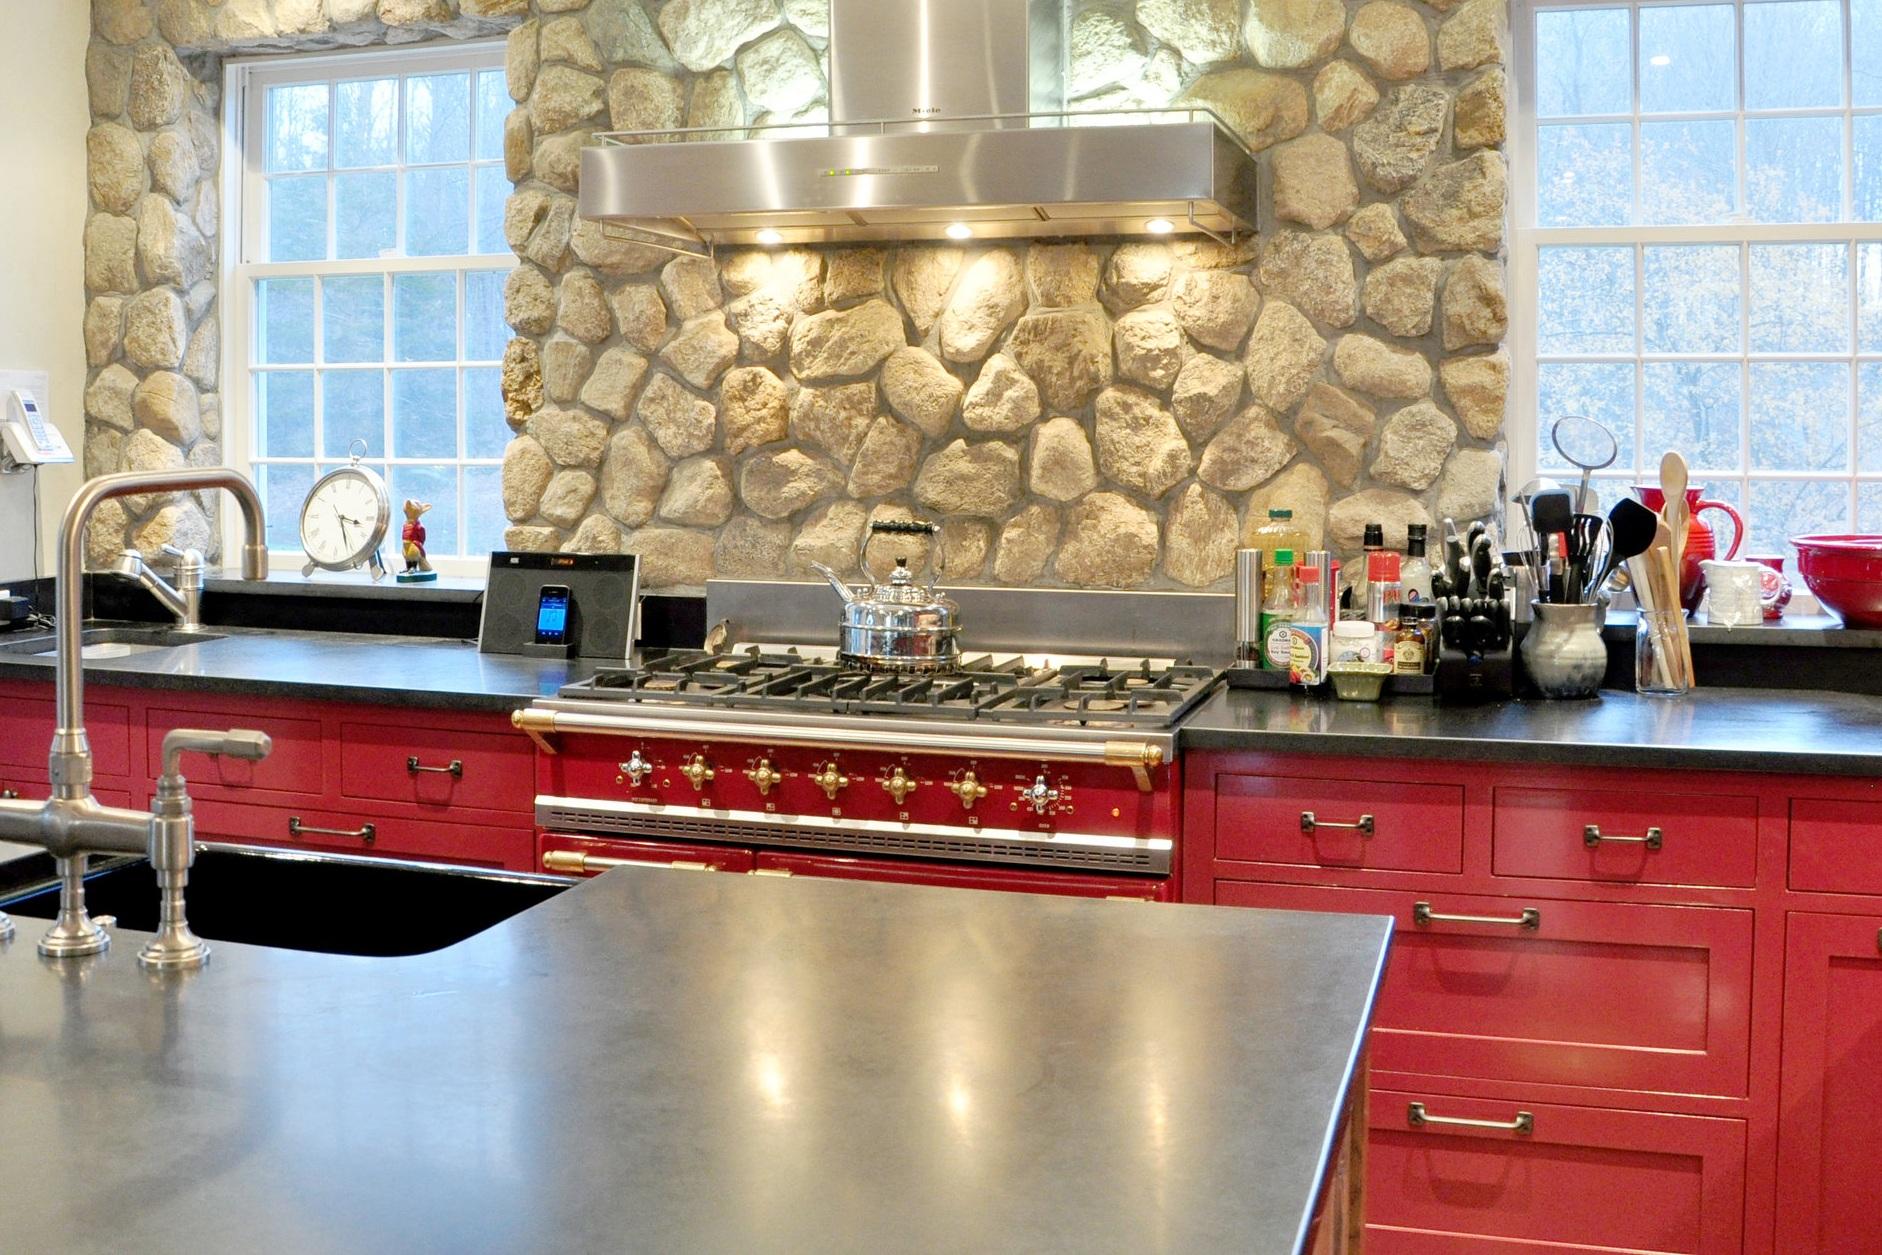 kwon_kitchen.jpg